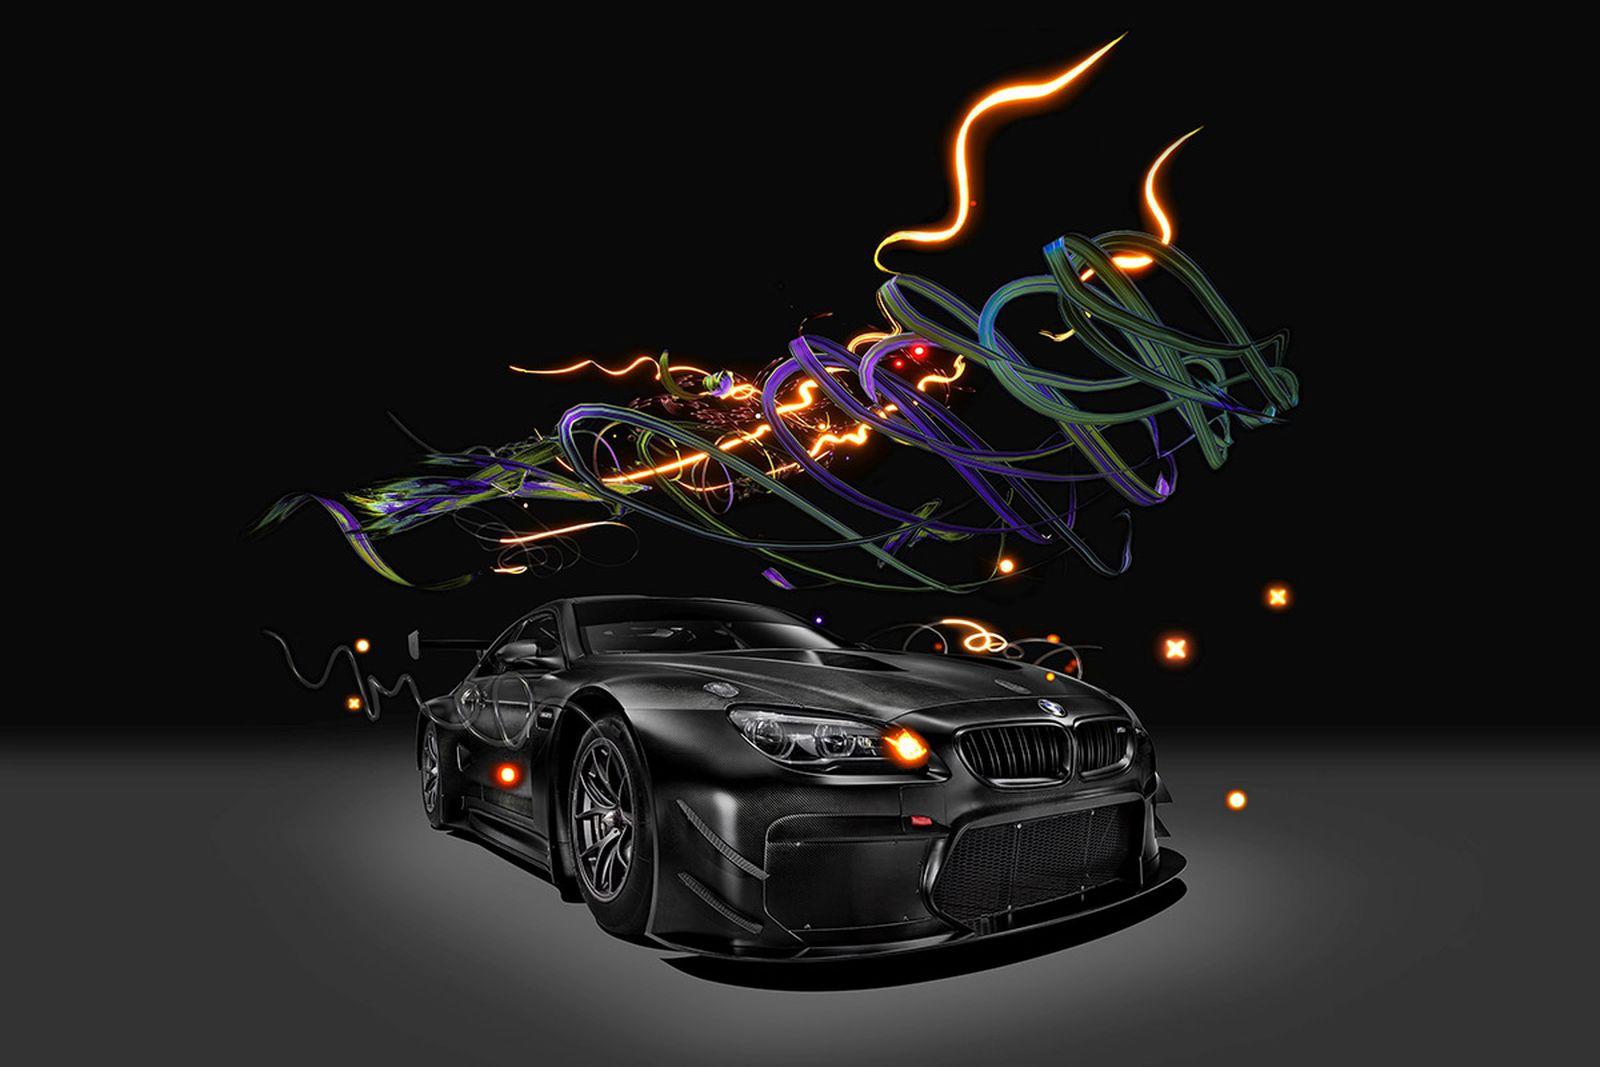 BMW Art Car 18, Cao Fei, 2017